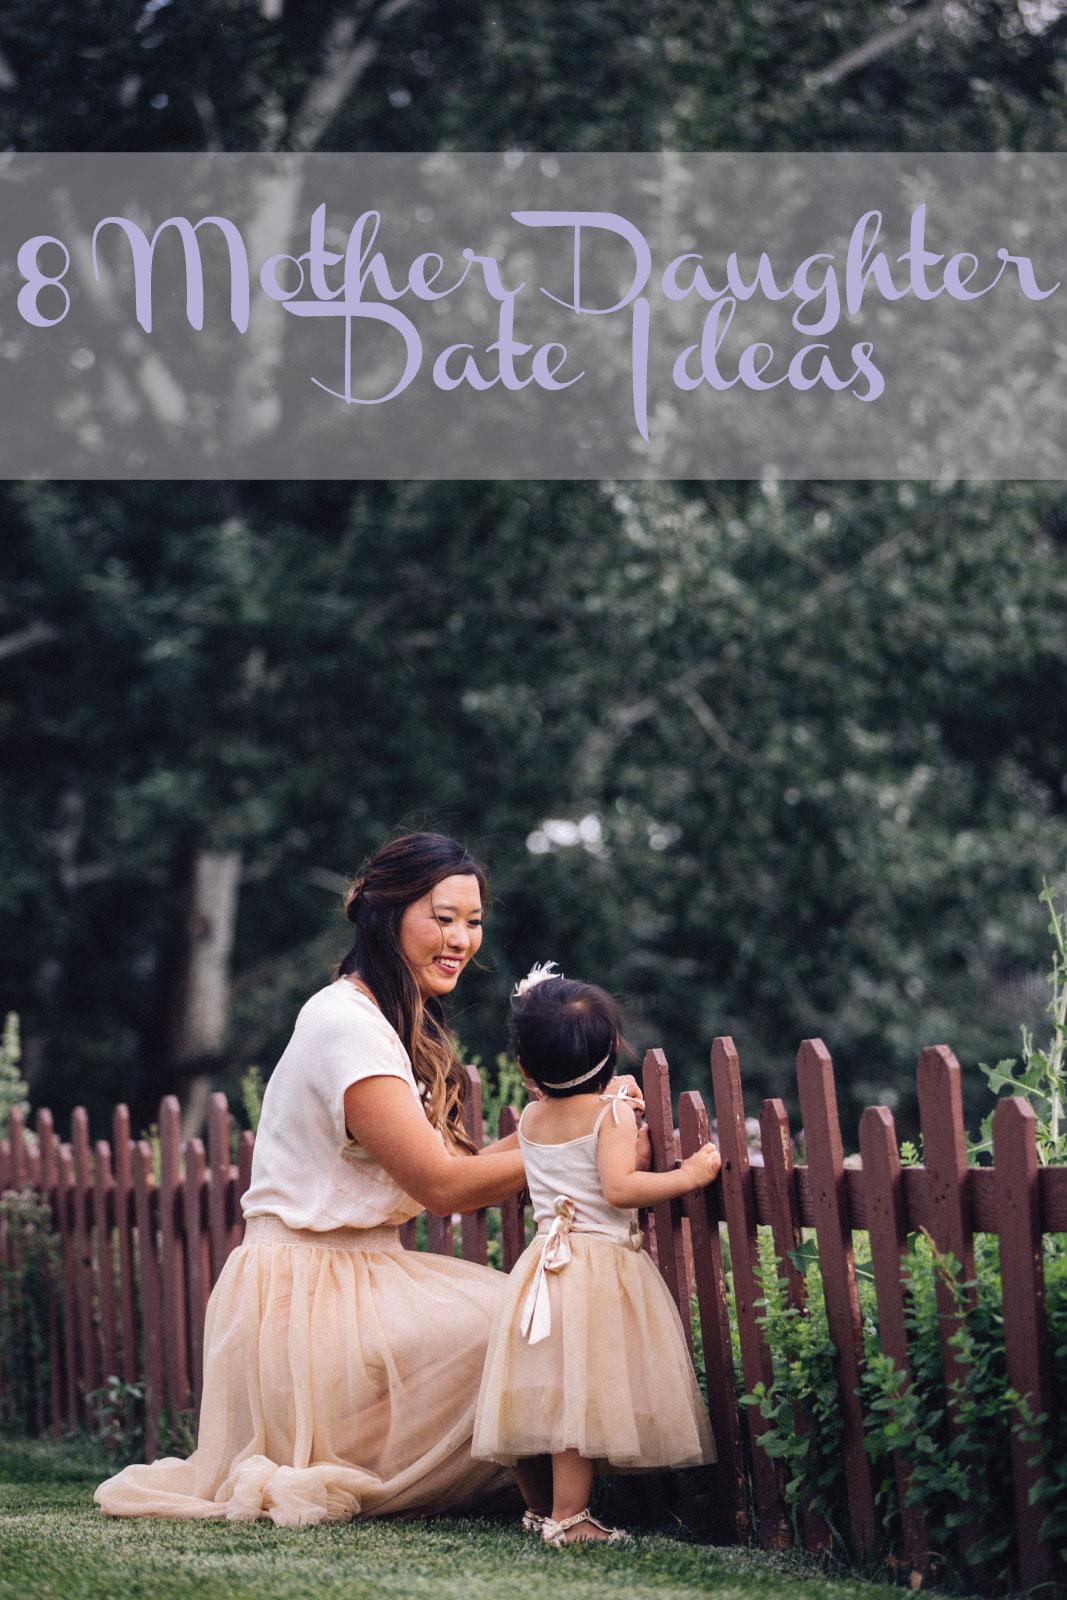 8 Mother Daughter Date Ideas